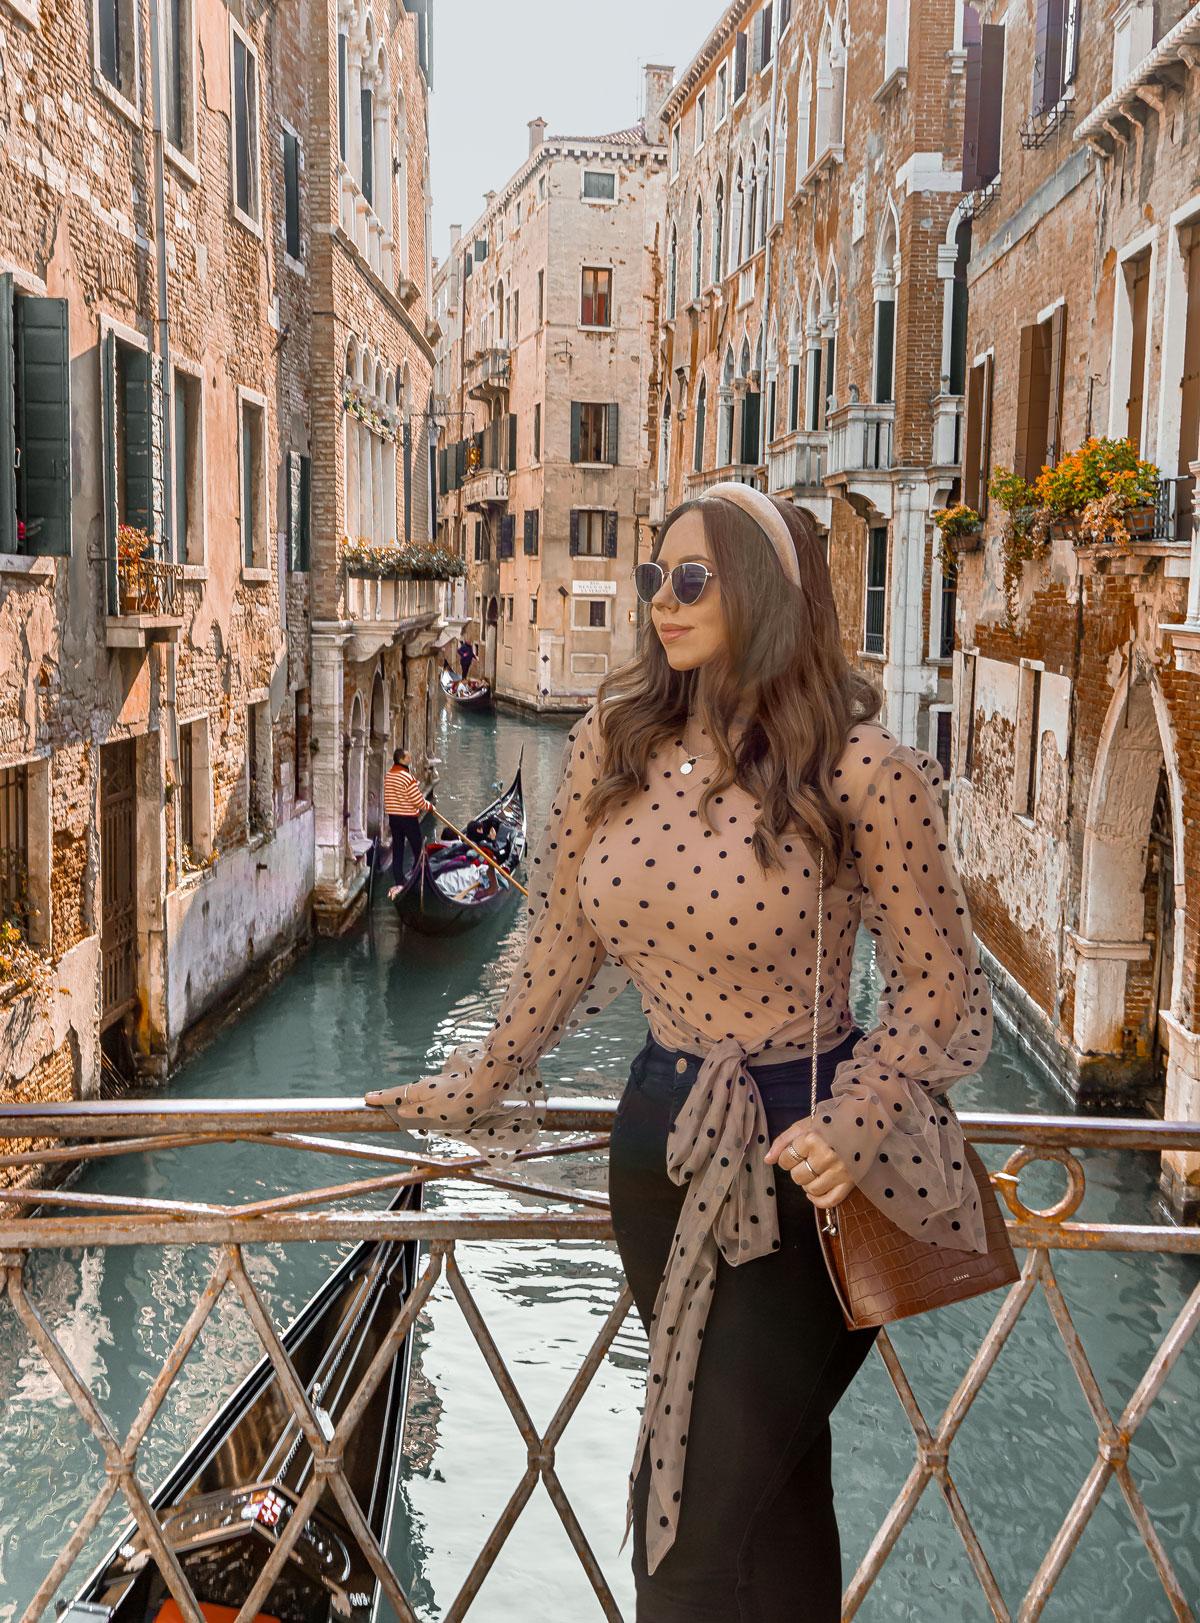 28-top-things-to-do-in-Venice---Venice-Instagram-spots-–-Venice-bucket-list---kelseyinlondon---kelsey-heinrichs---venice-gondola-ride---venice-grand-canal